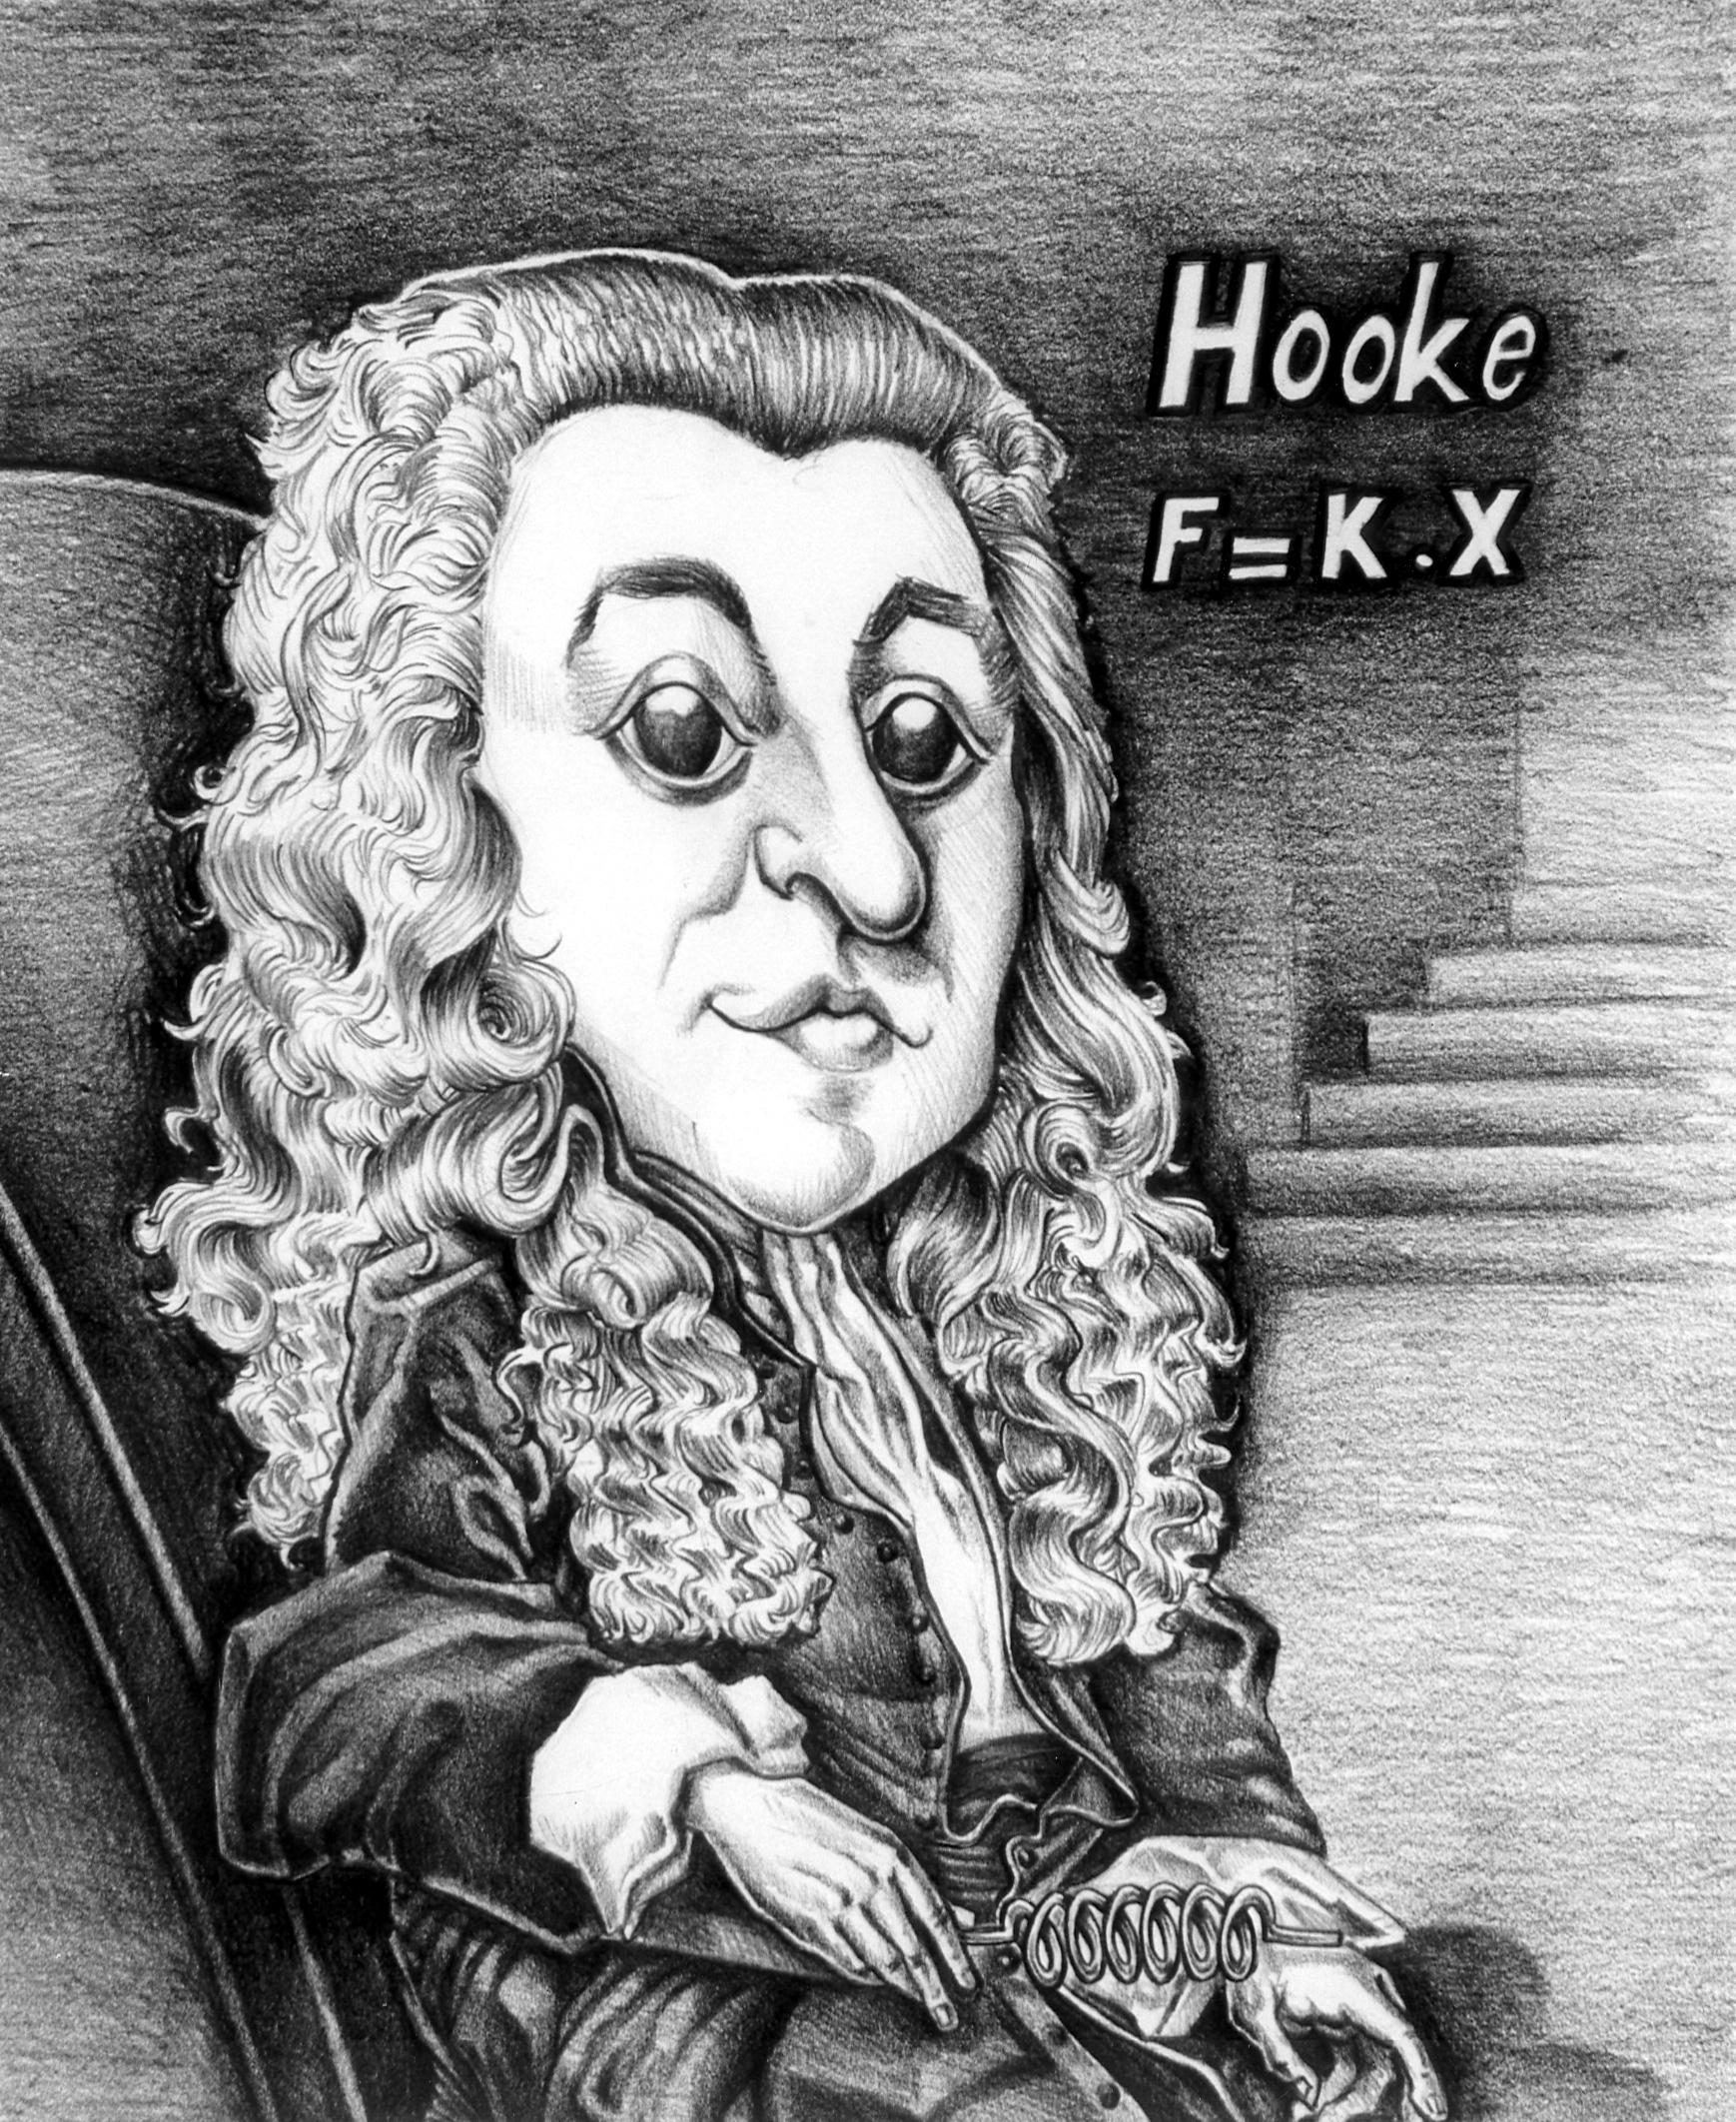 Robert Hooke (1635, 1703)